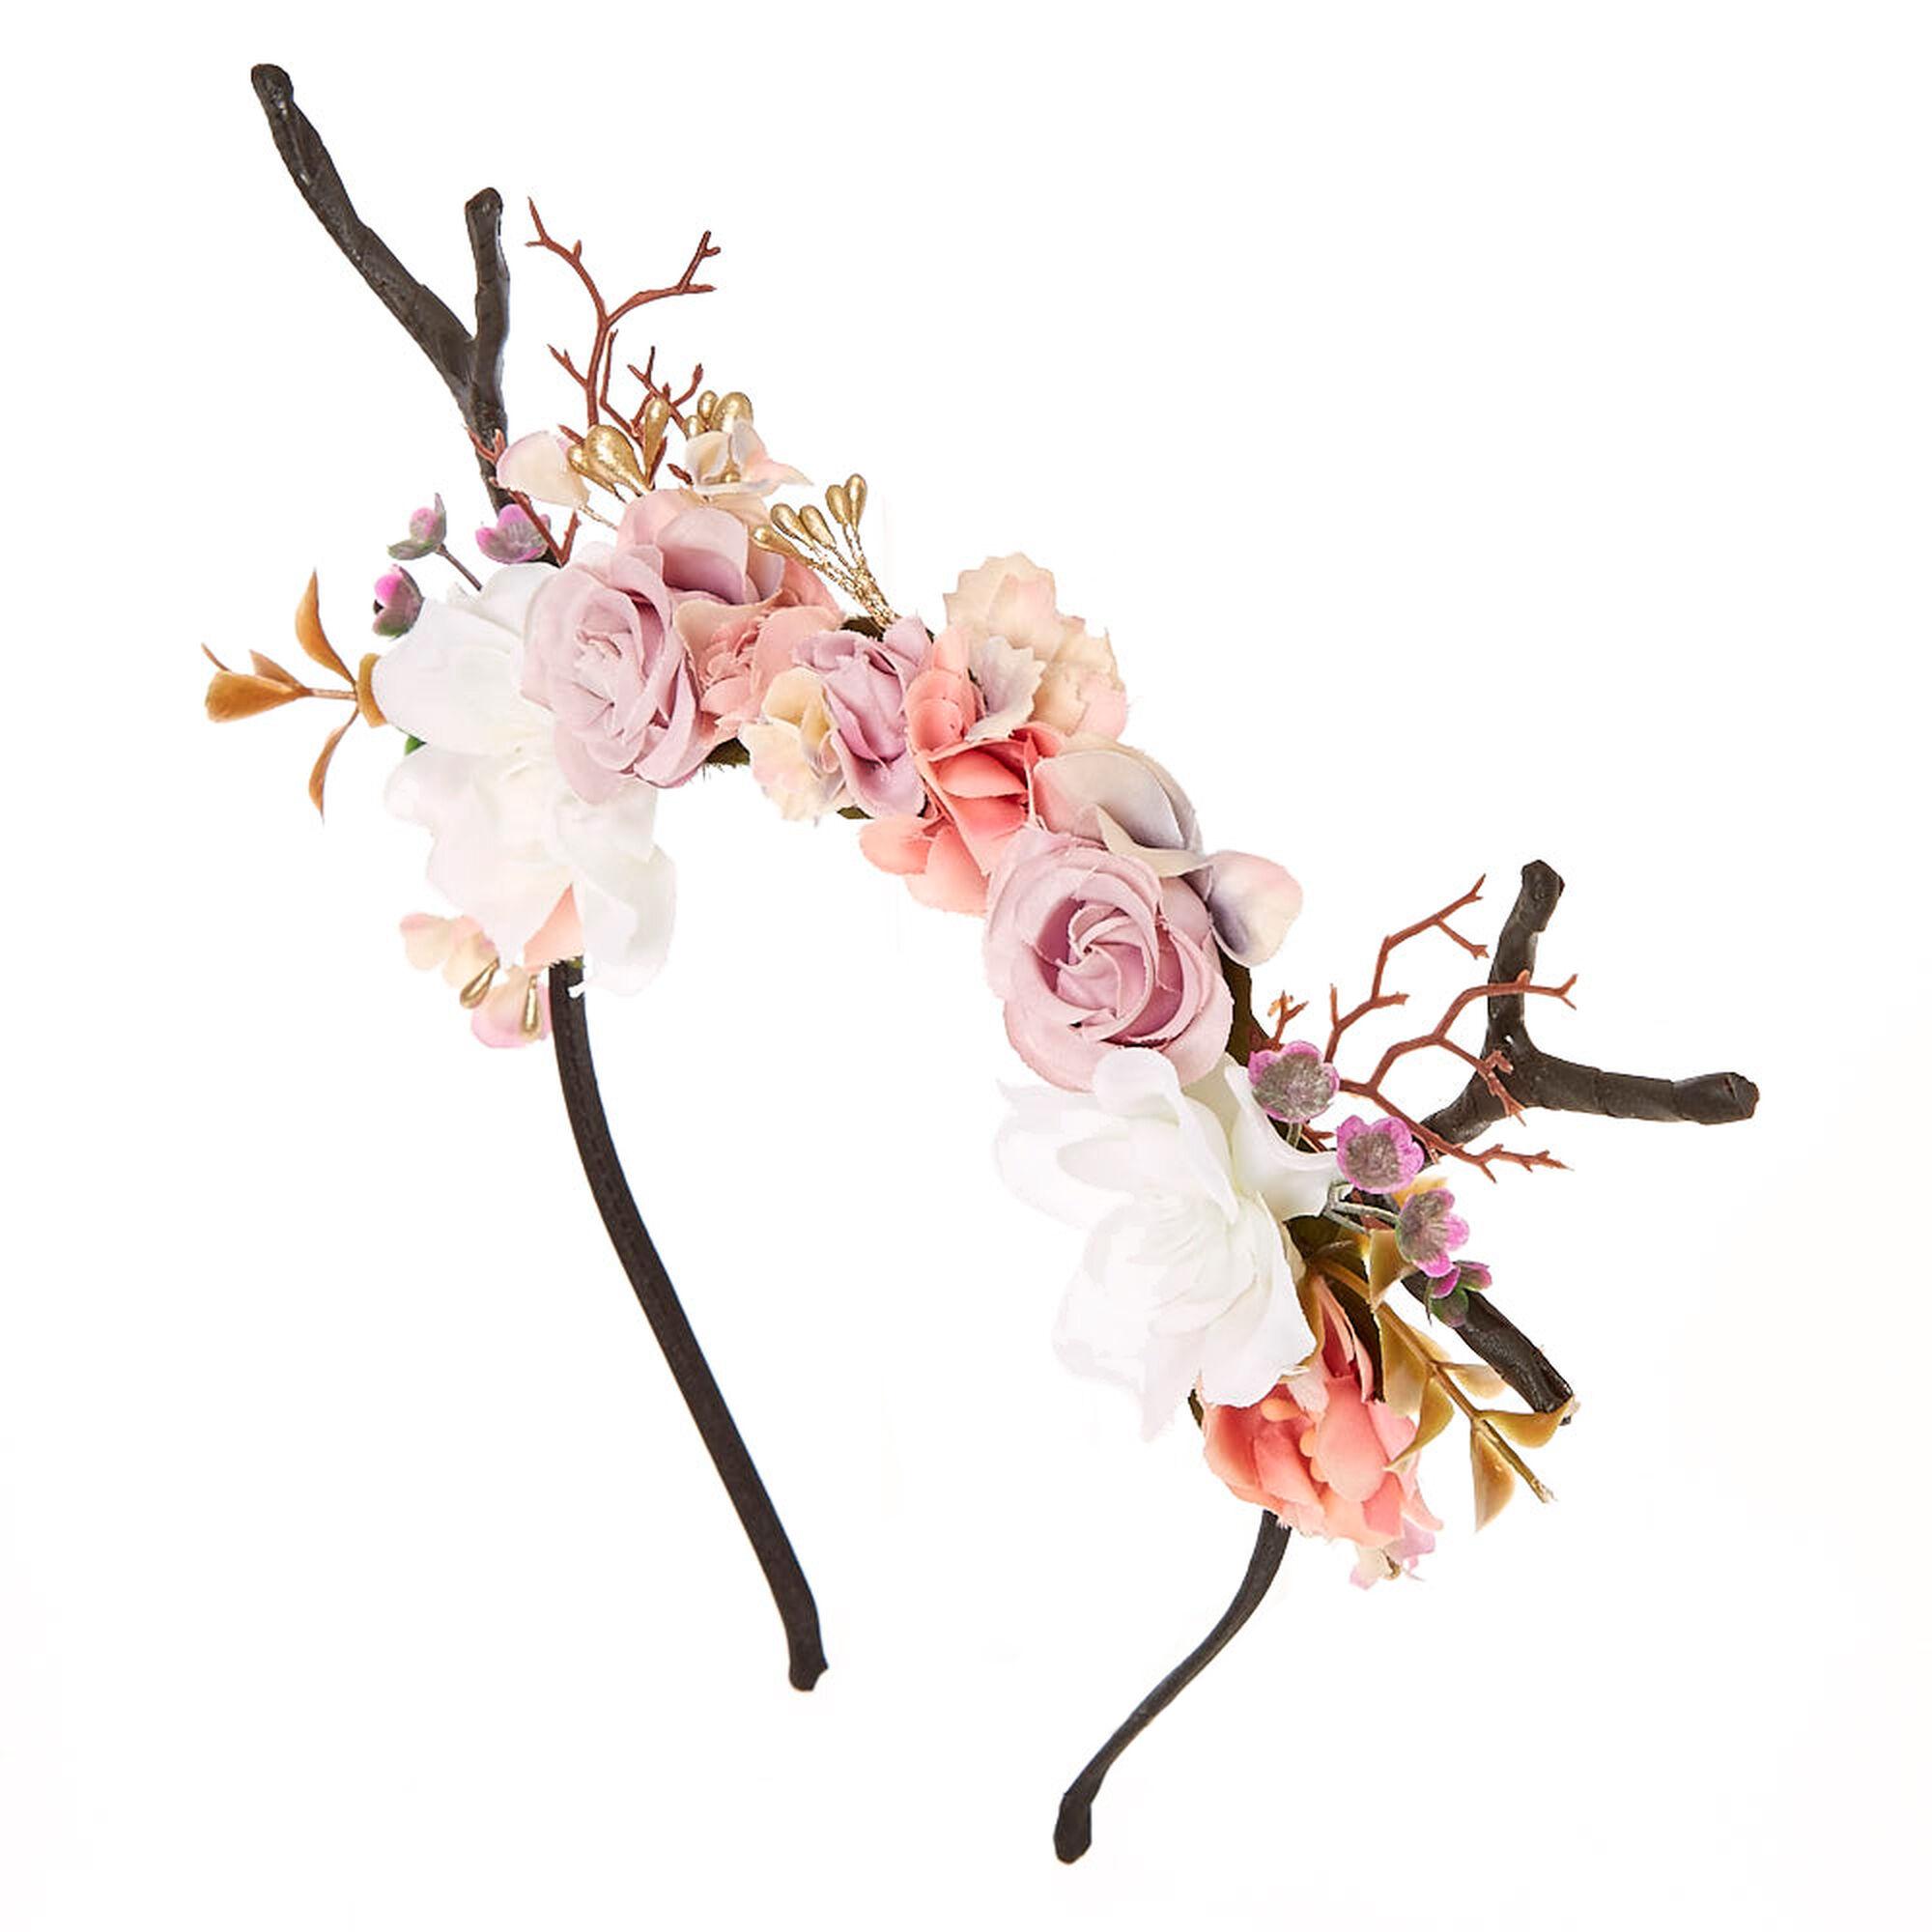 Deer antler flower crown headband claires us deer antler flower crown headband izmirmasajfo